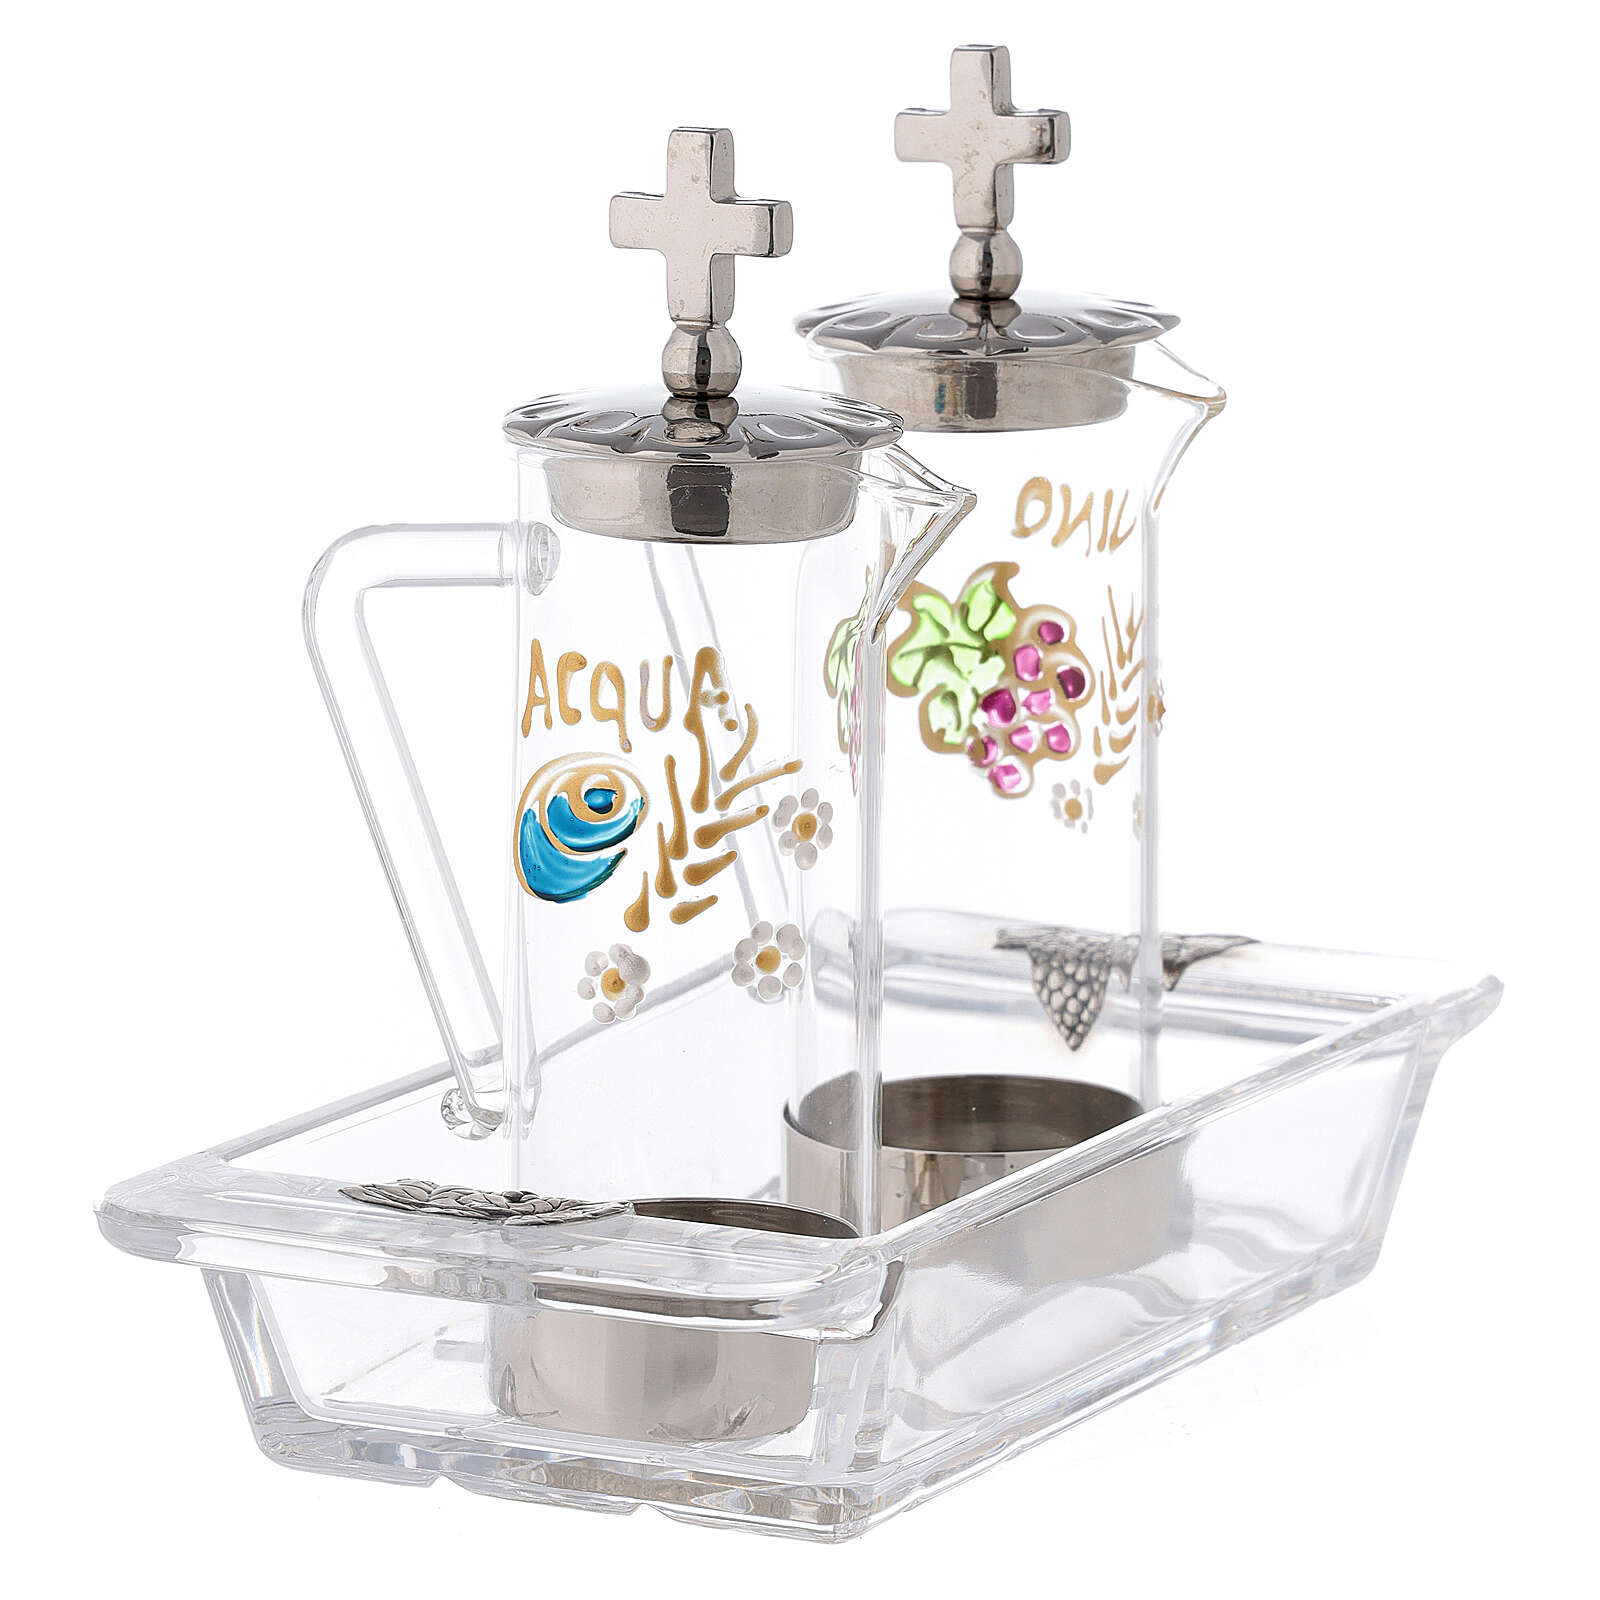 Coppia ampolline acqua e vino modello Ravenna ml 60 4